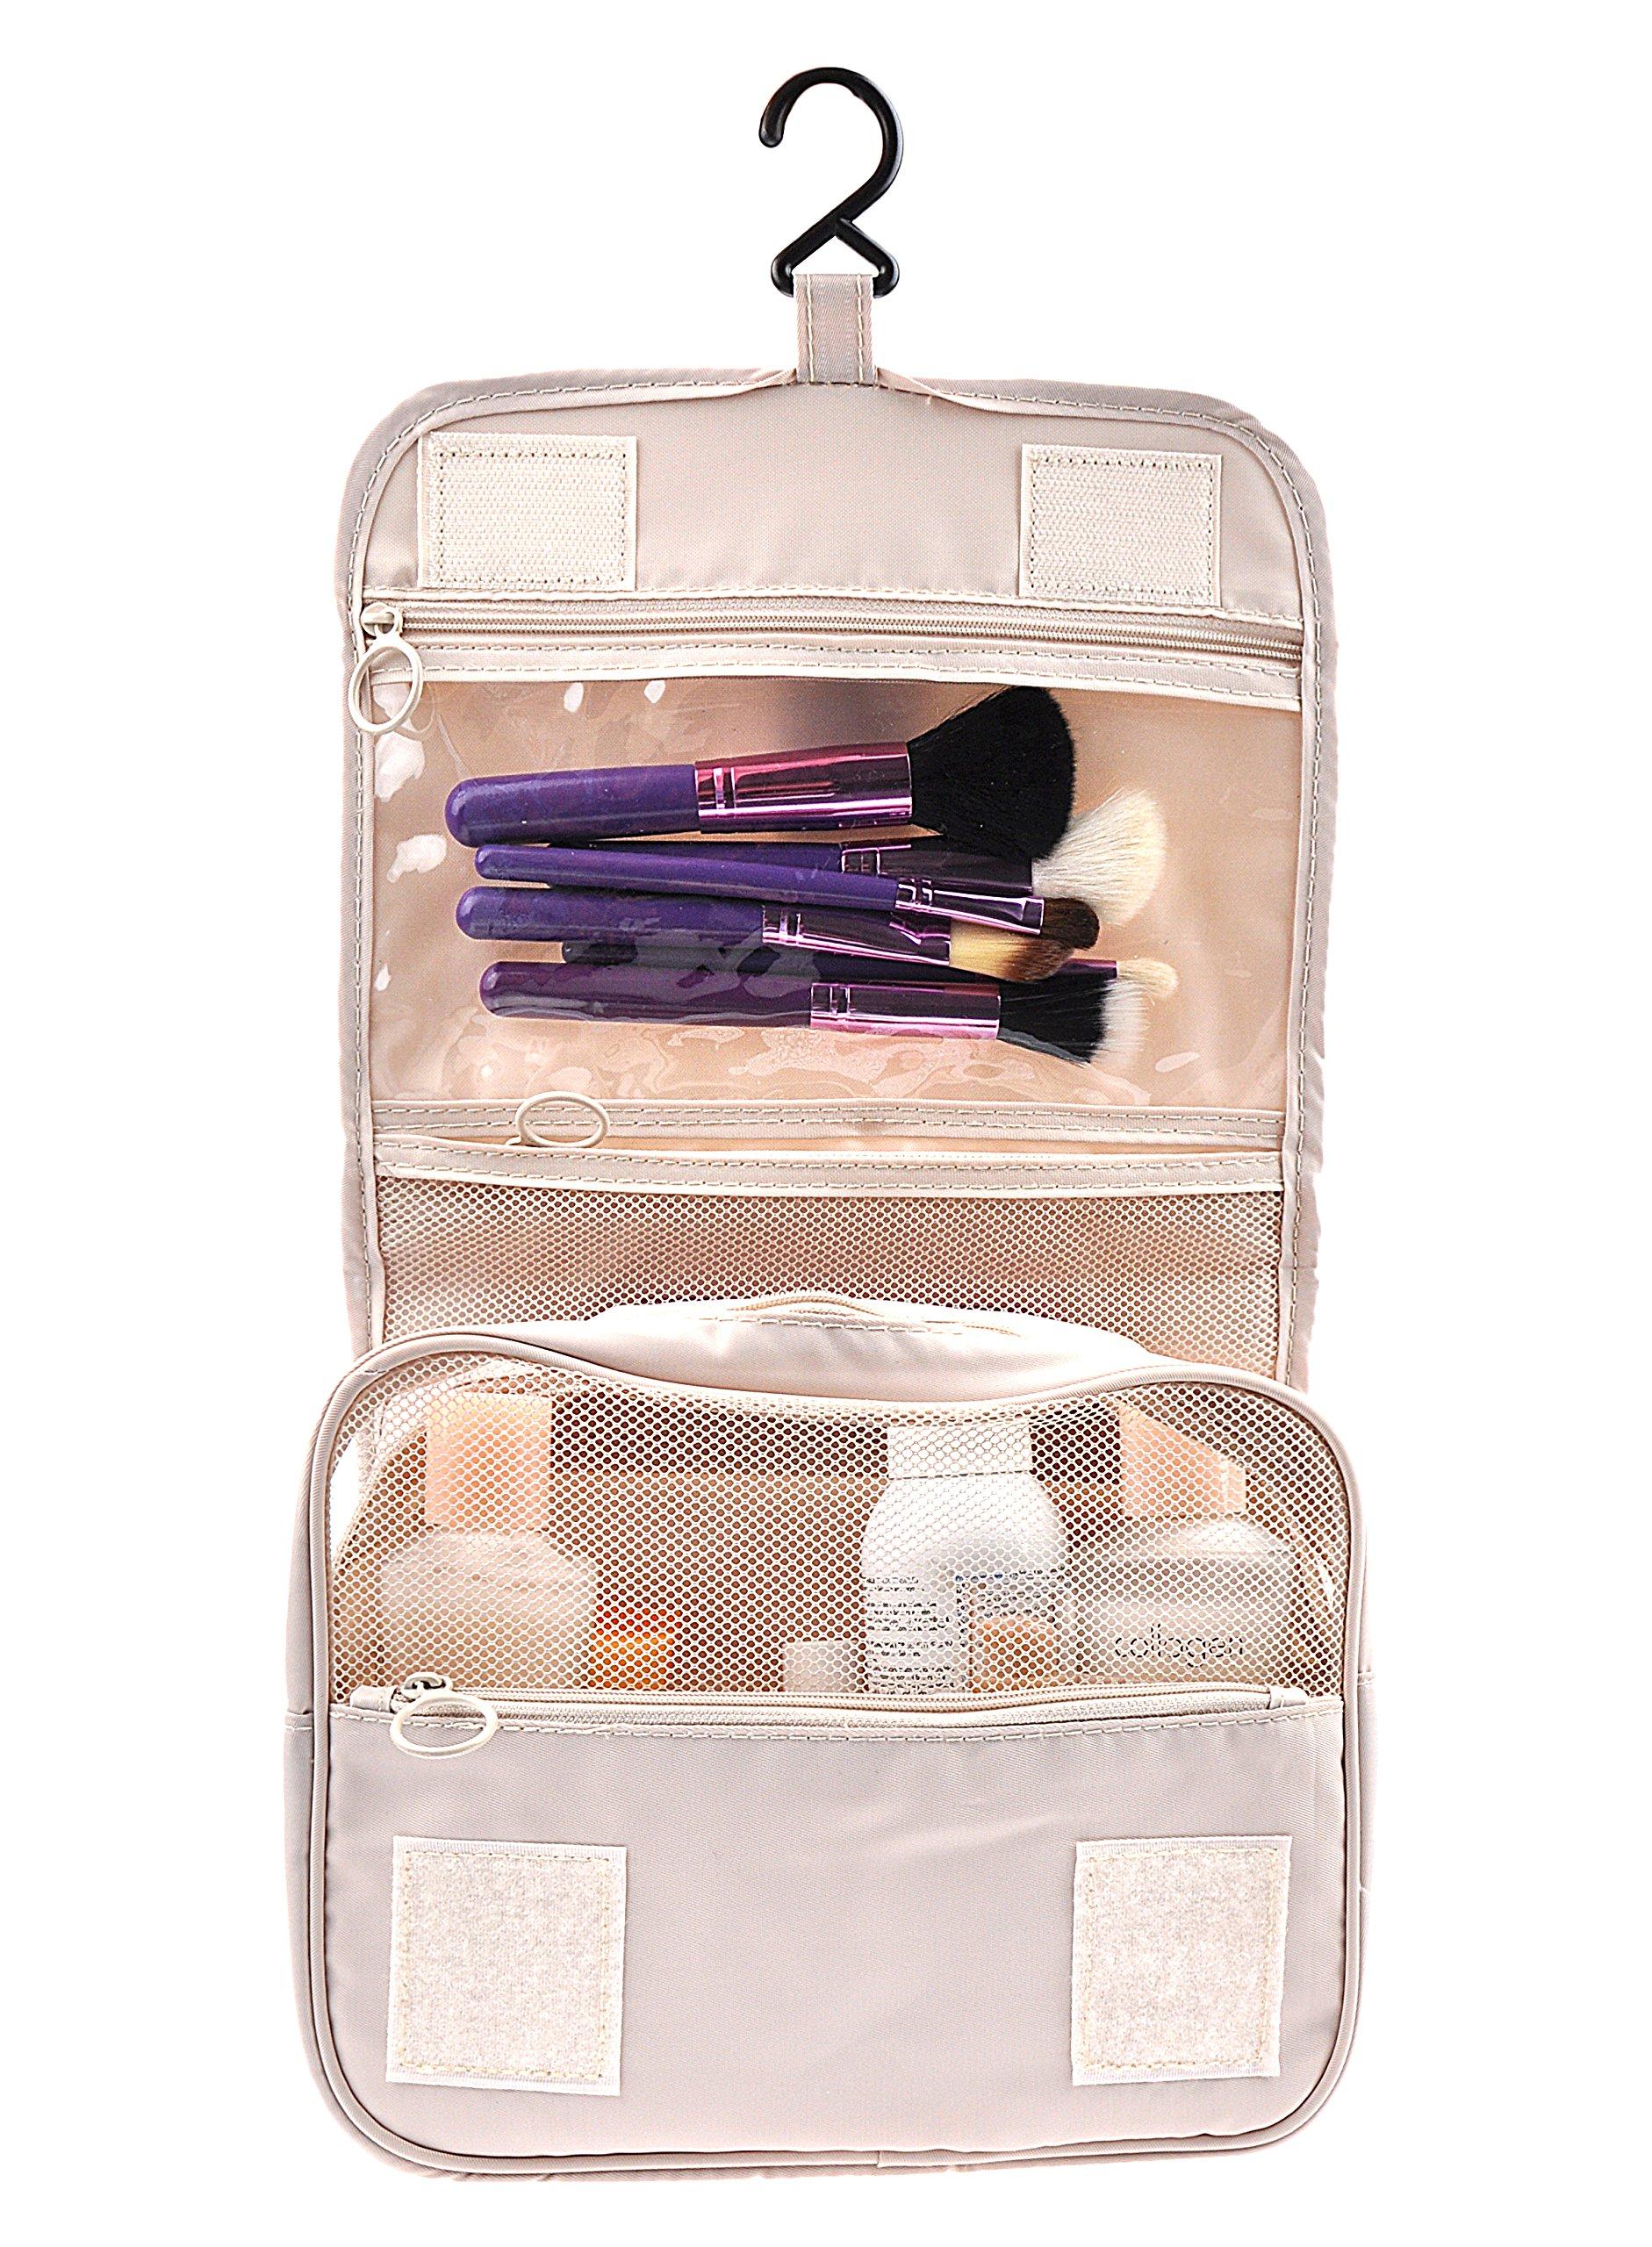 Cosmetic Makeup Bag Case, Hanging Toiletry Bag, Travel Organizer Travel Kit For Women Men, Cream Beige